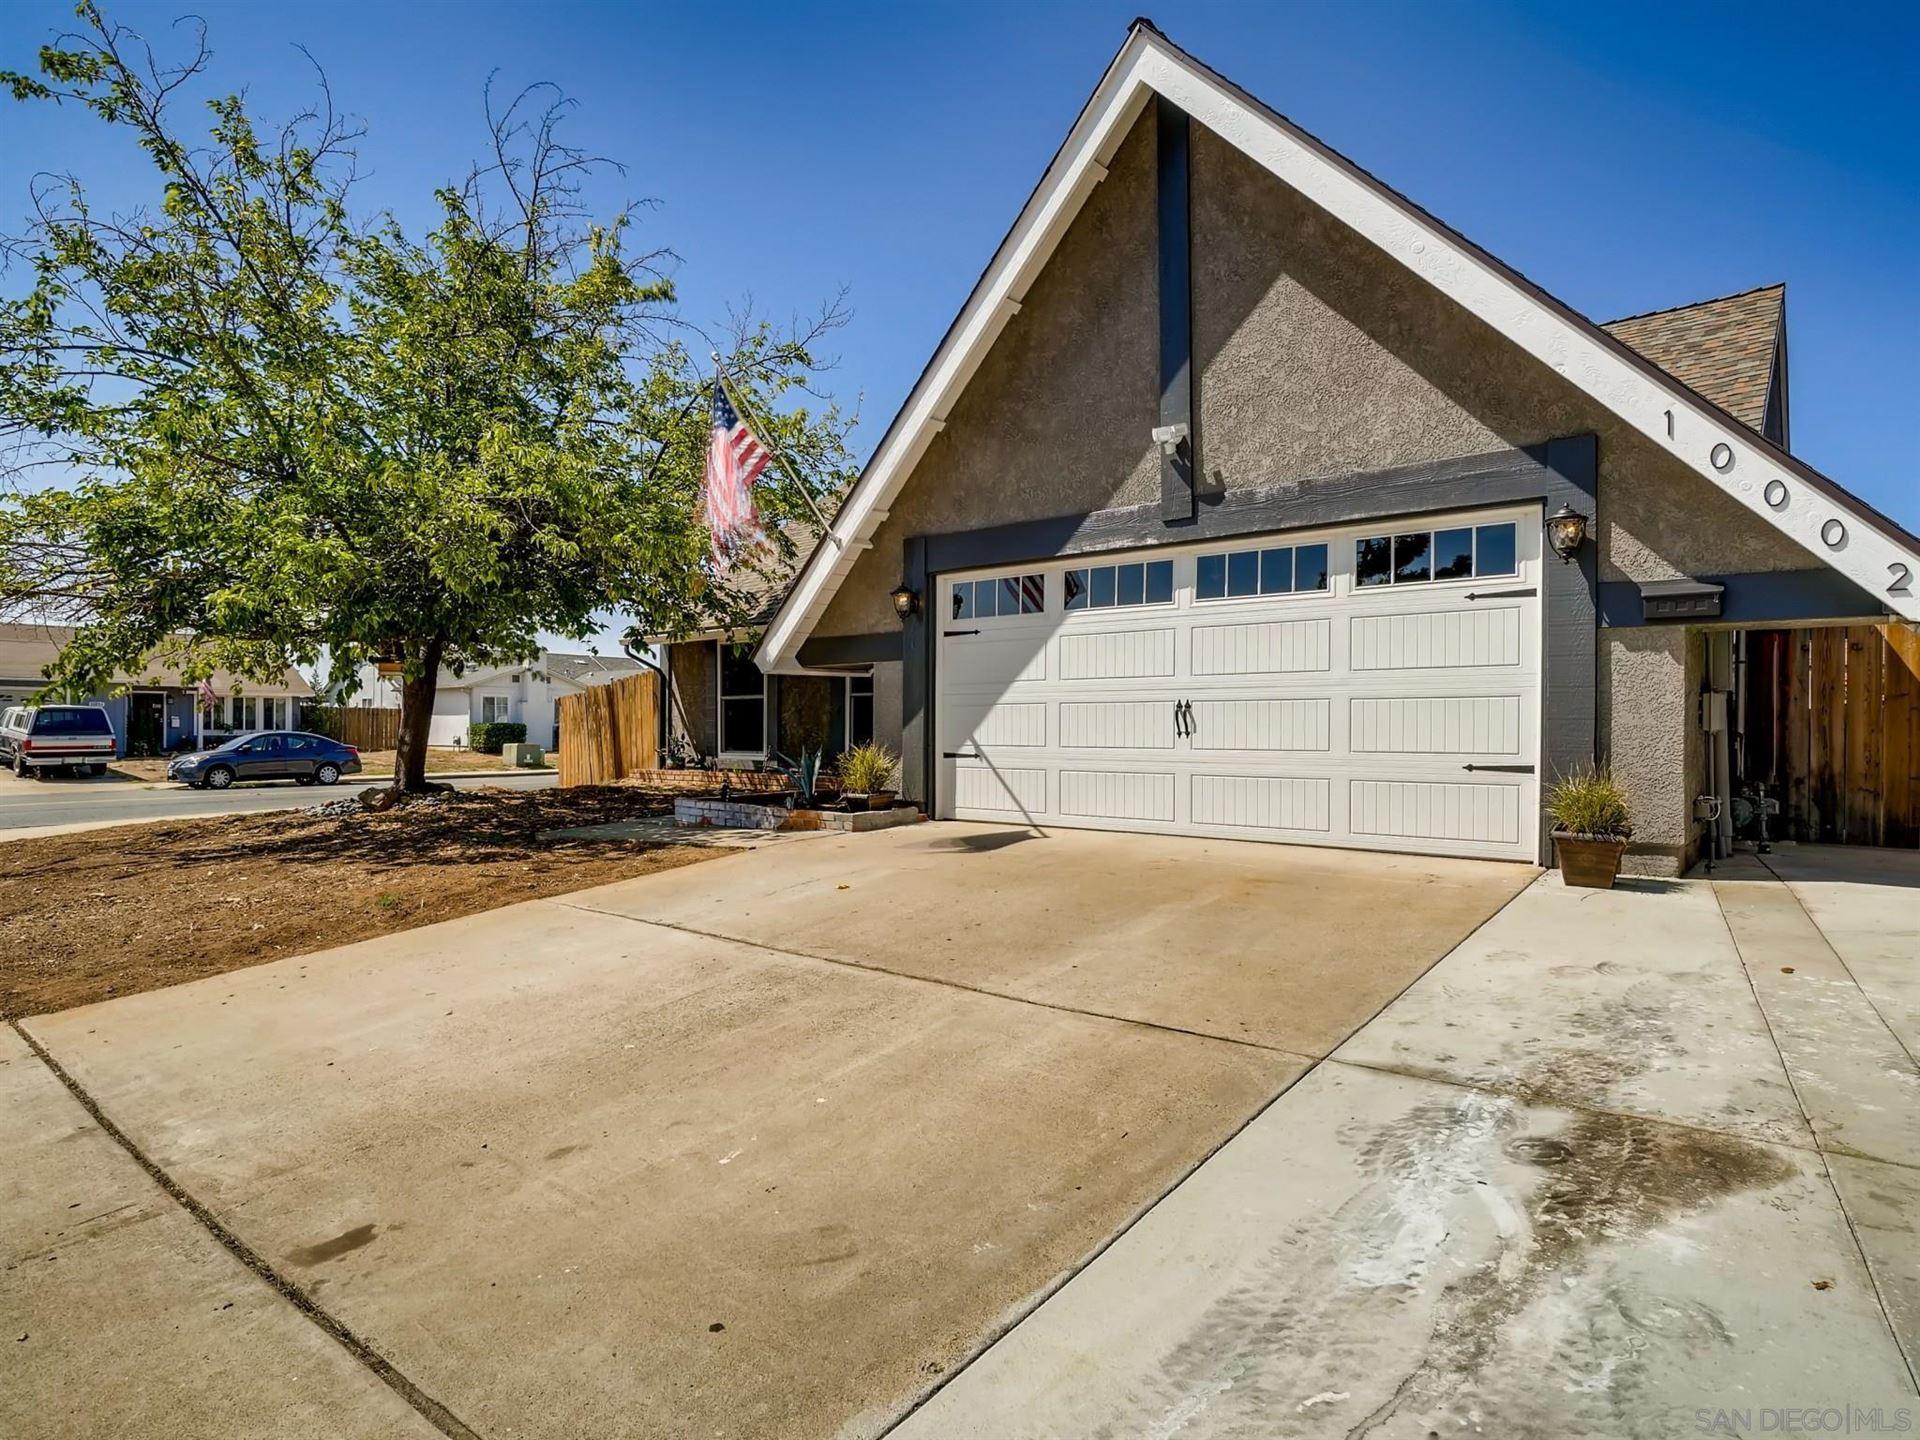 Photo of 10002 Anja Pl, Lakeside, CA 92040 (MLS # 210026425)